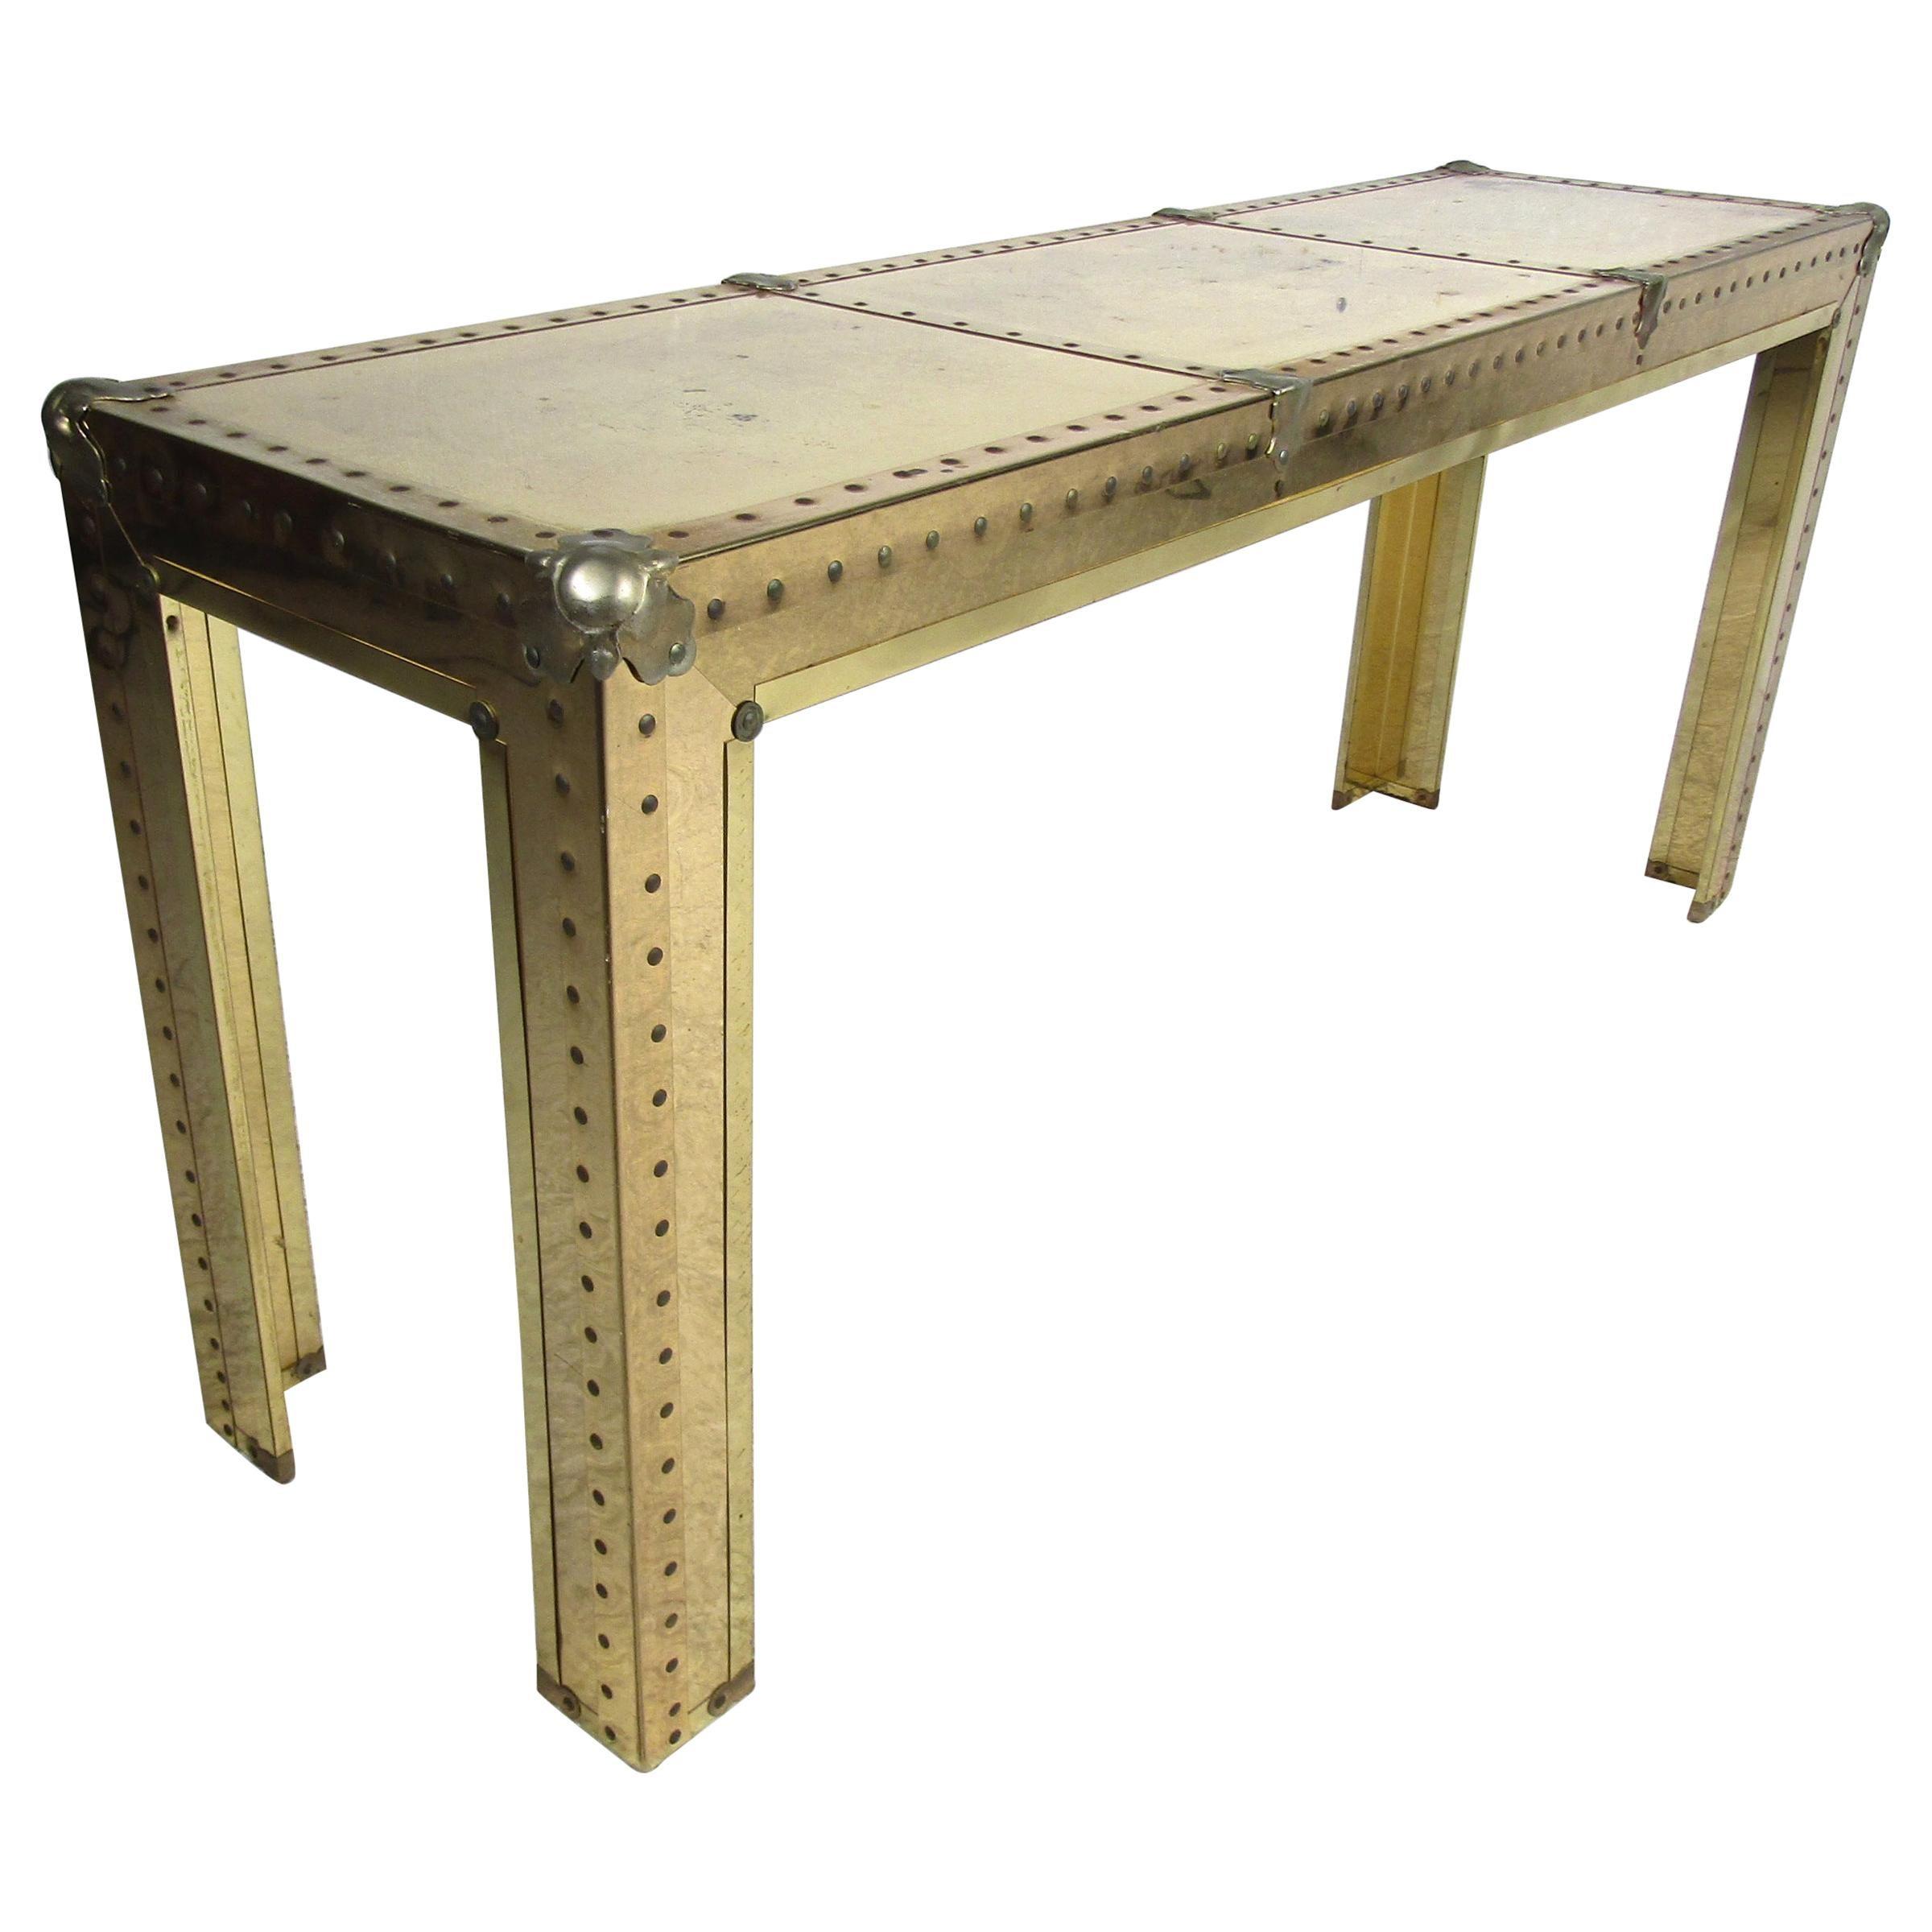 Stunning Midcentury Brass Console Table